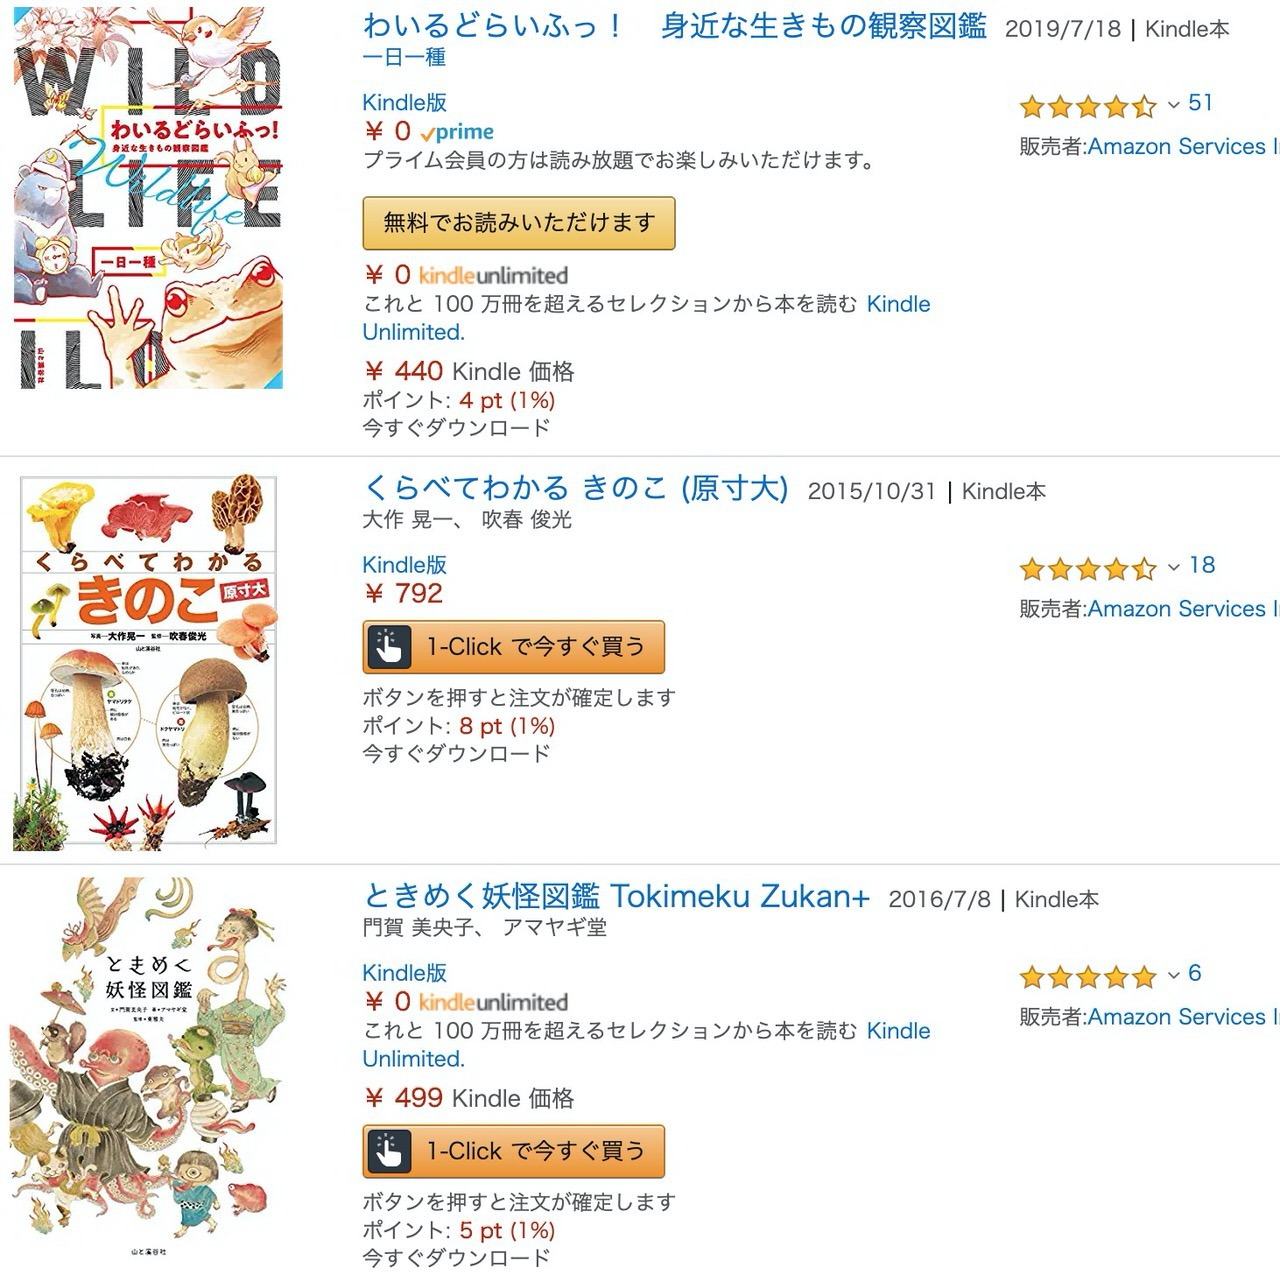 【Kindleセール】62冊の図鑑が対象「ヤマケイの図鑑フェア」(4/16まで)